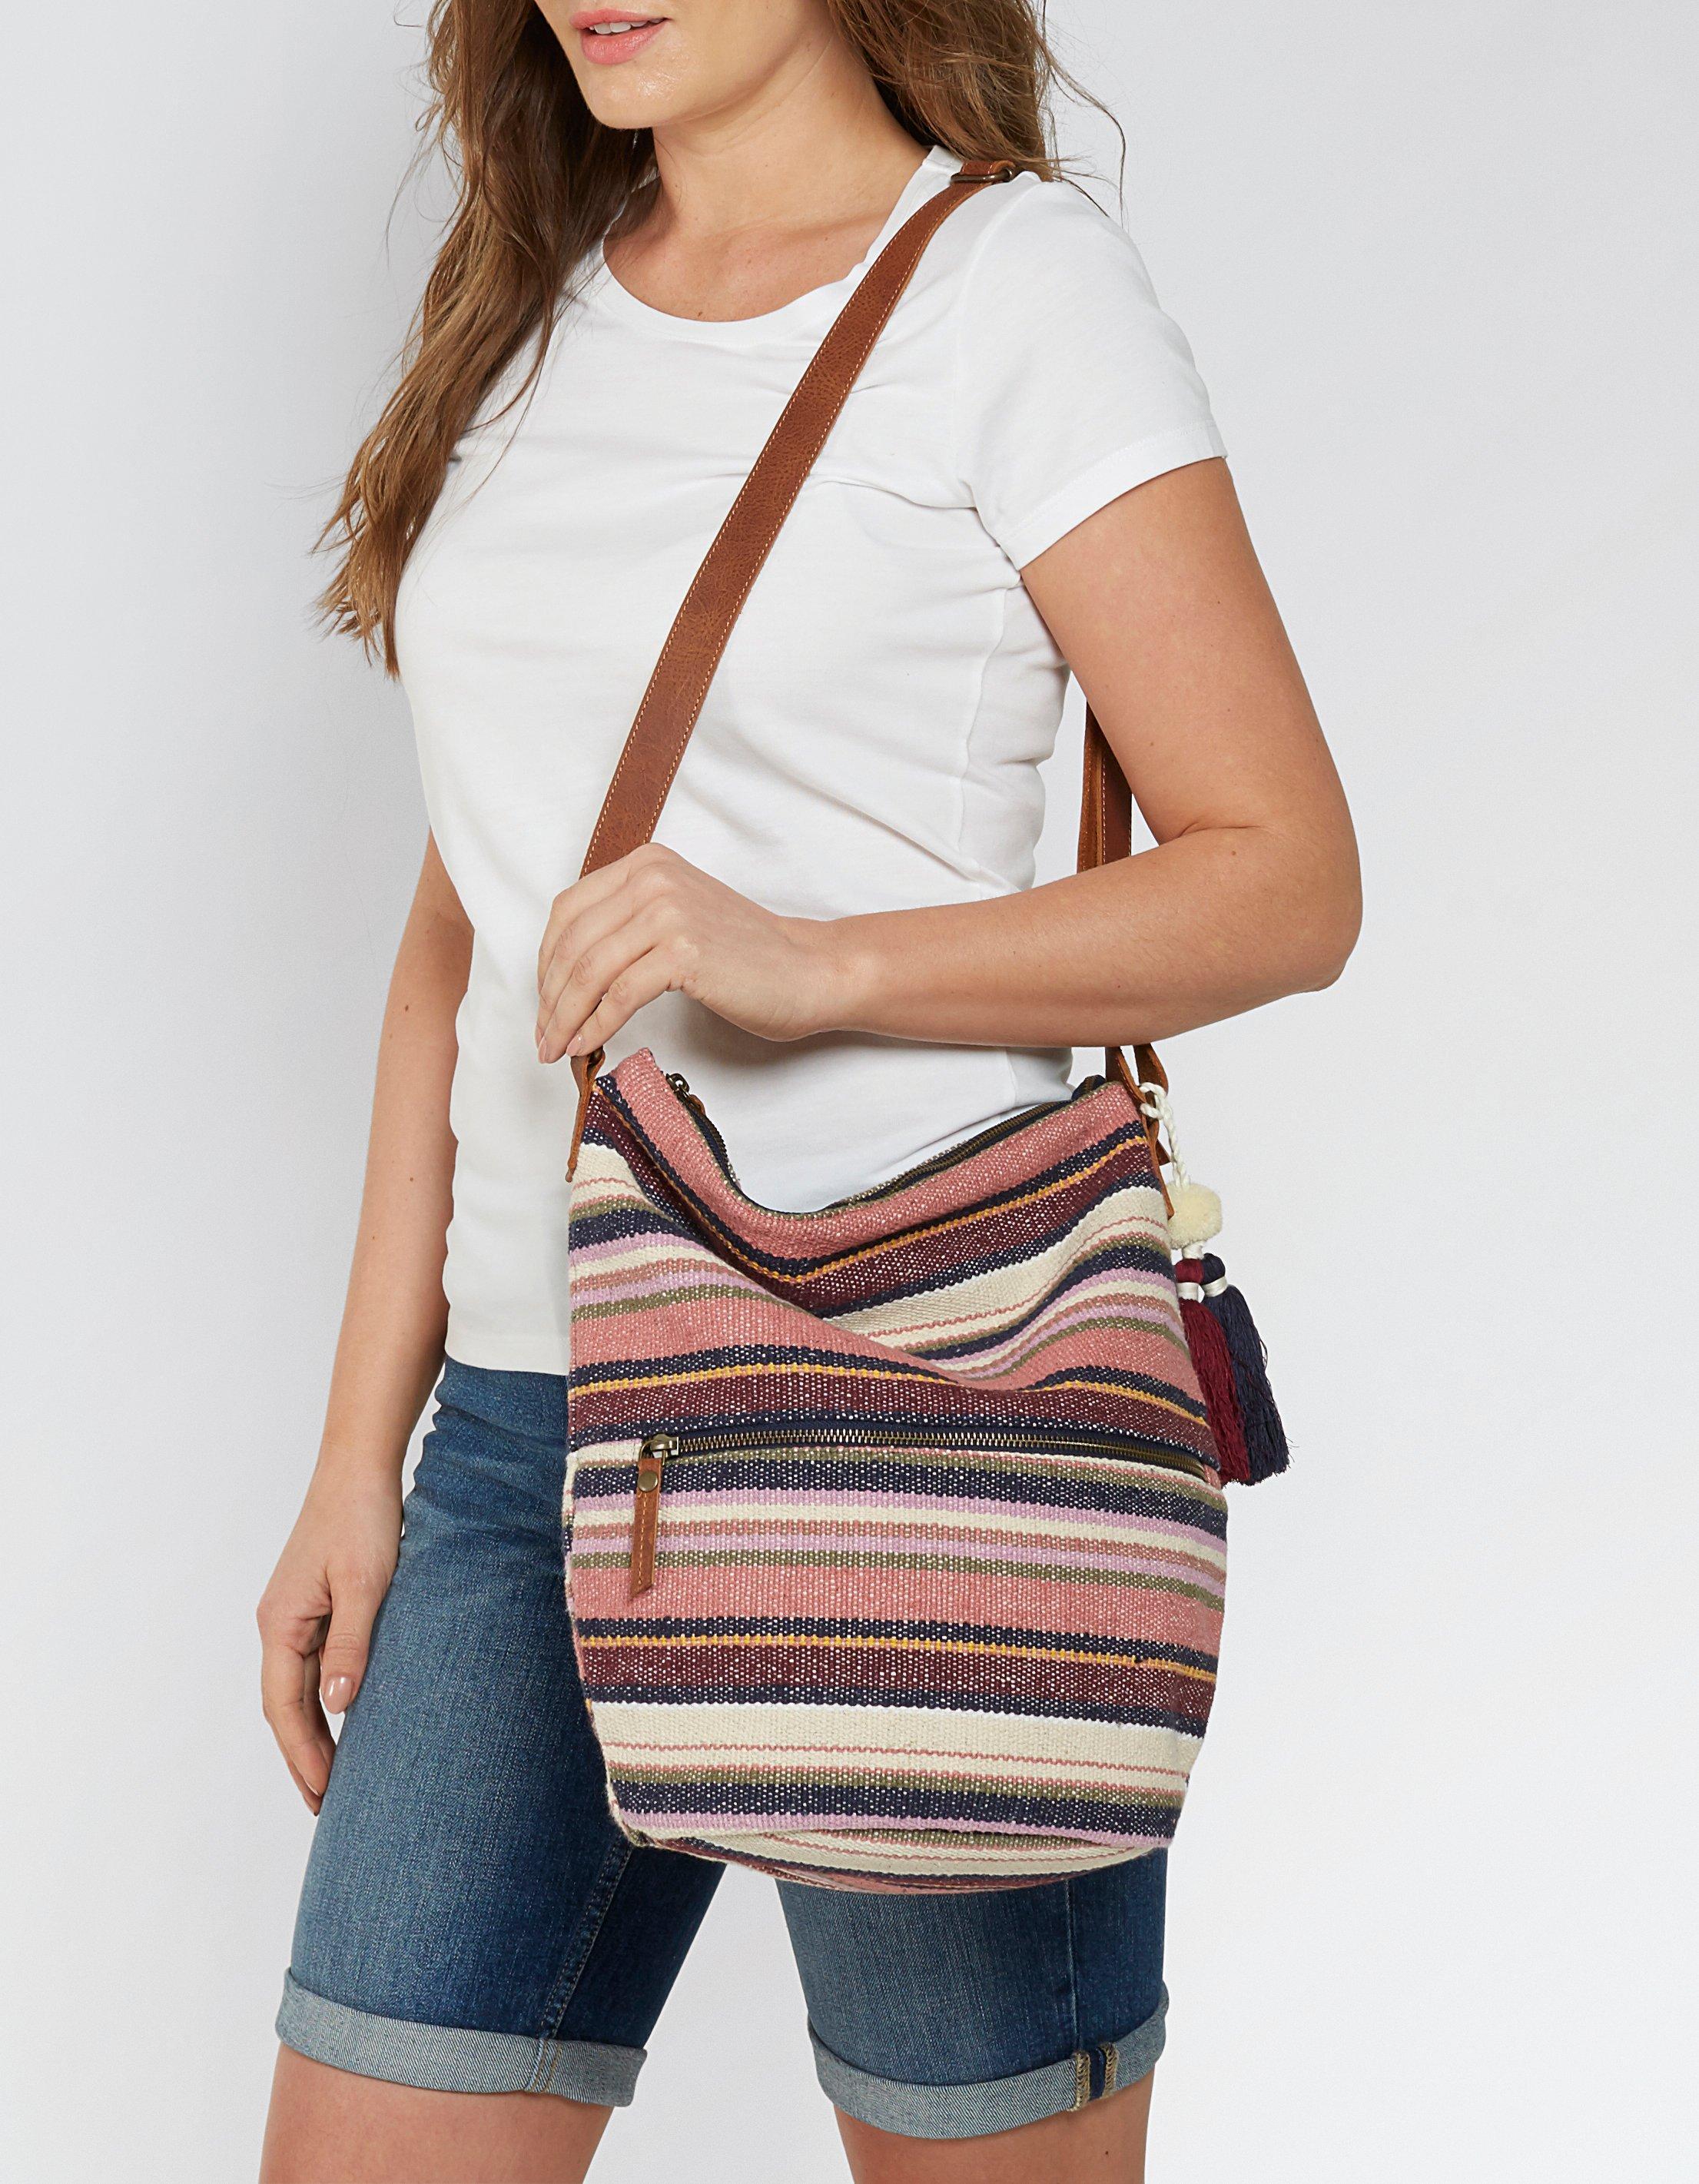 Woven Stripe Tia Cross Body Bag